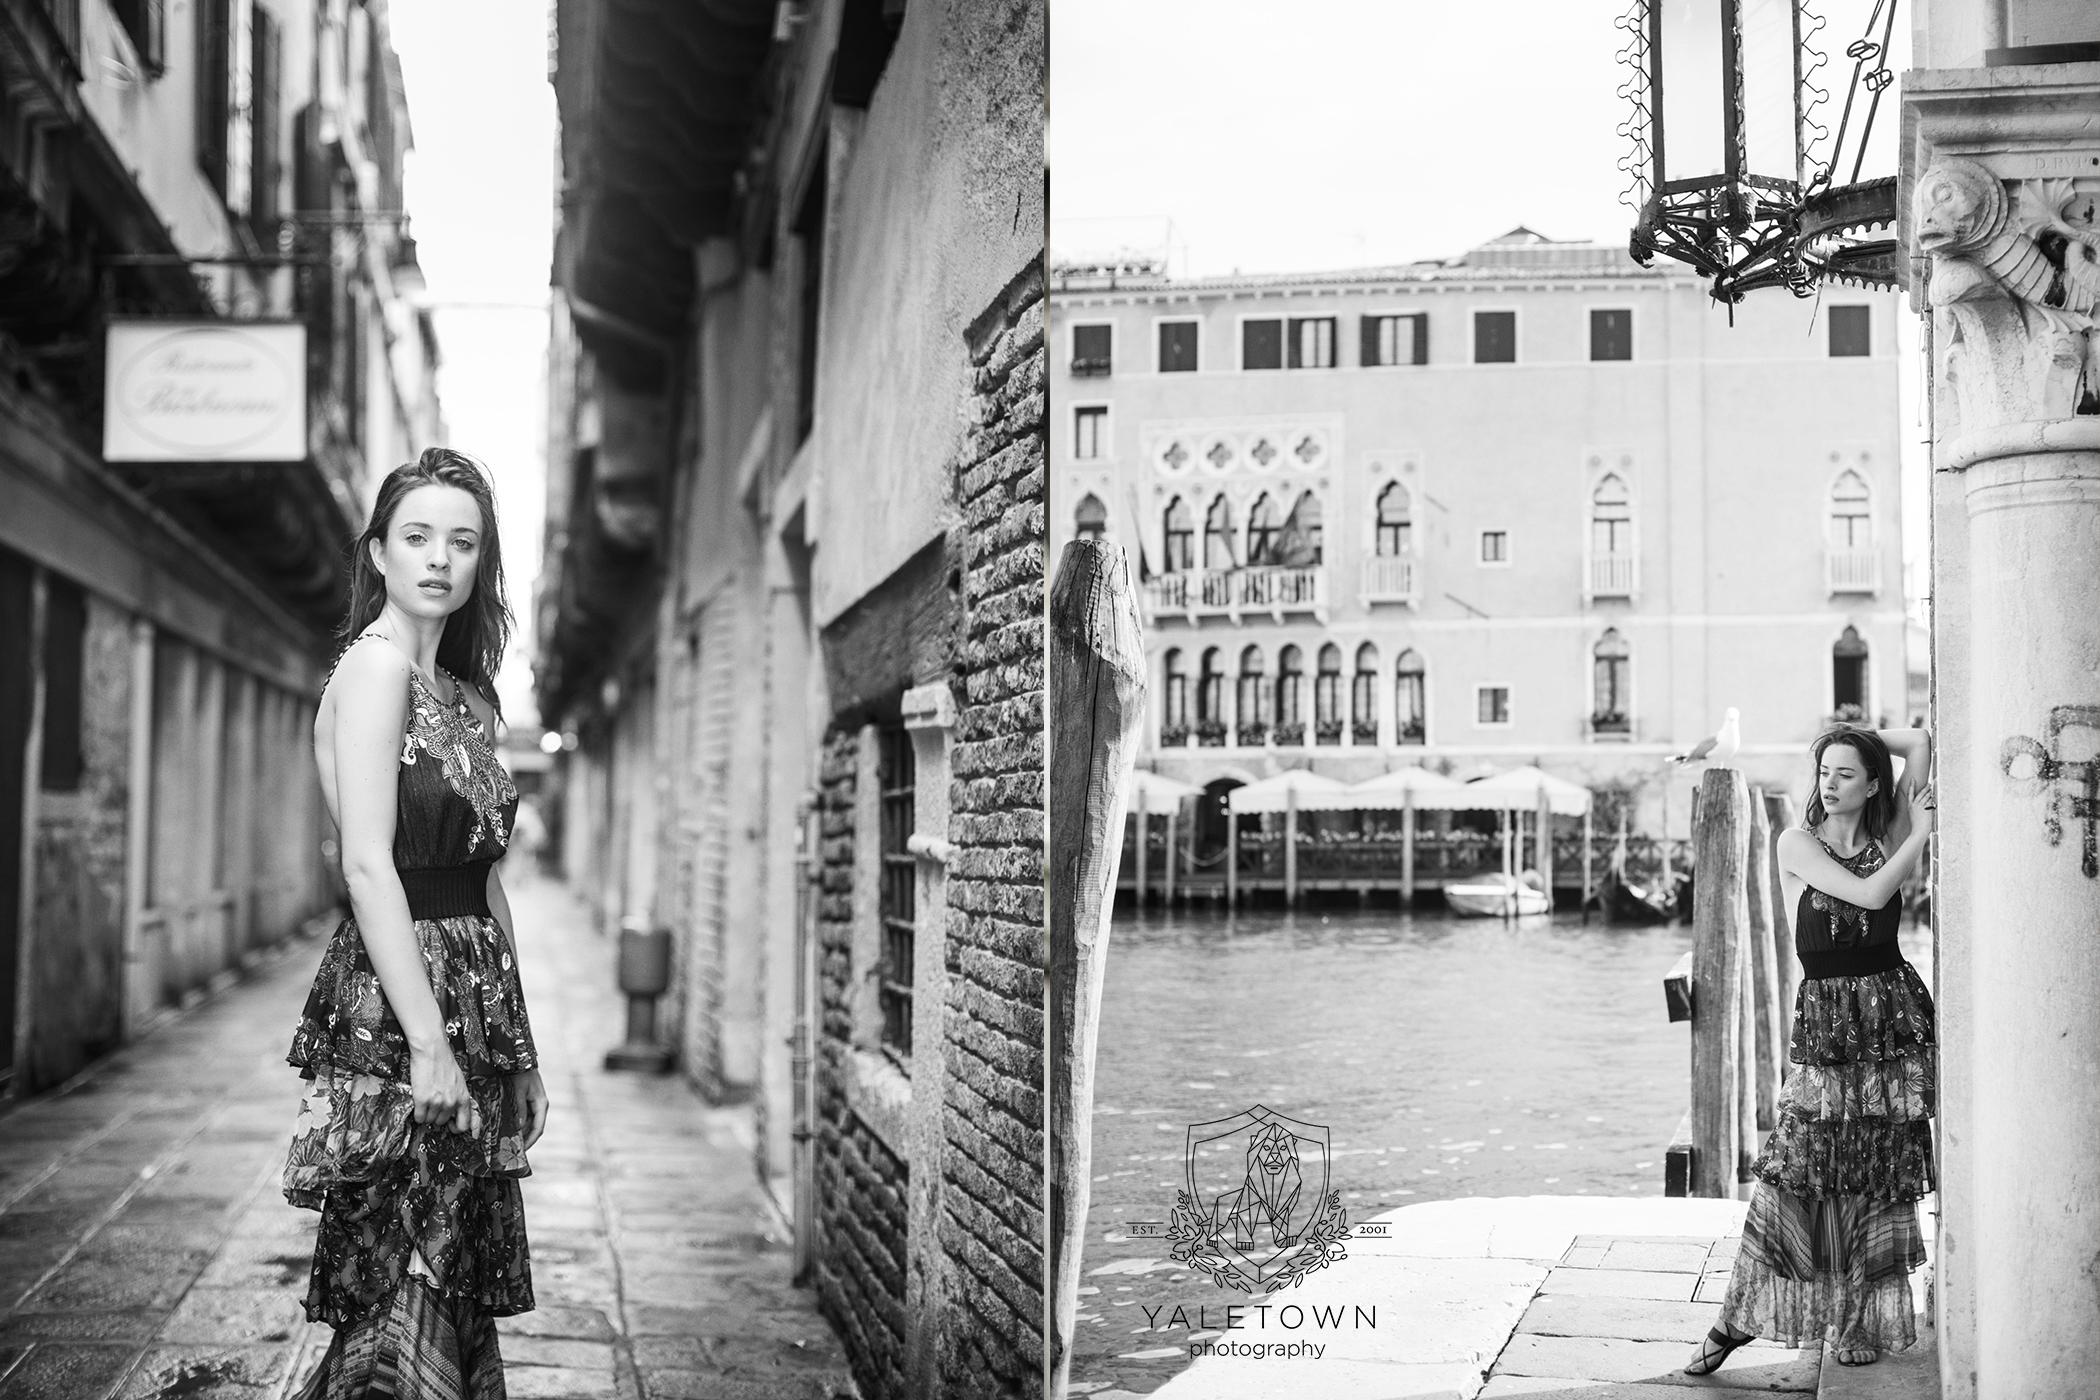 Venice-portrait-session-yaletown-photography-vacation-photographer-photo-021.jpg